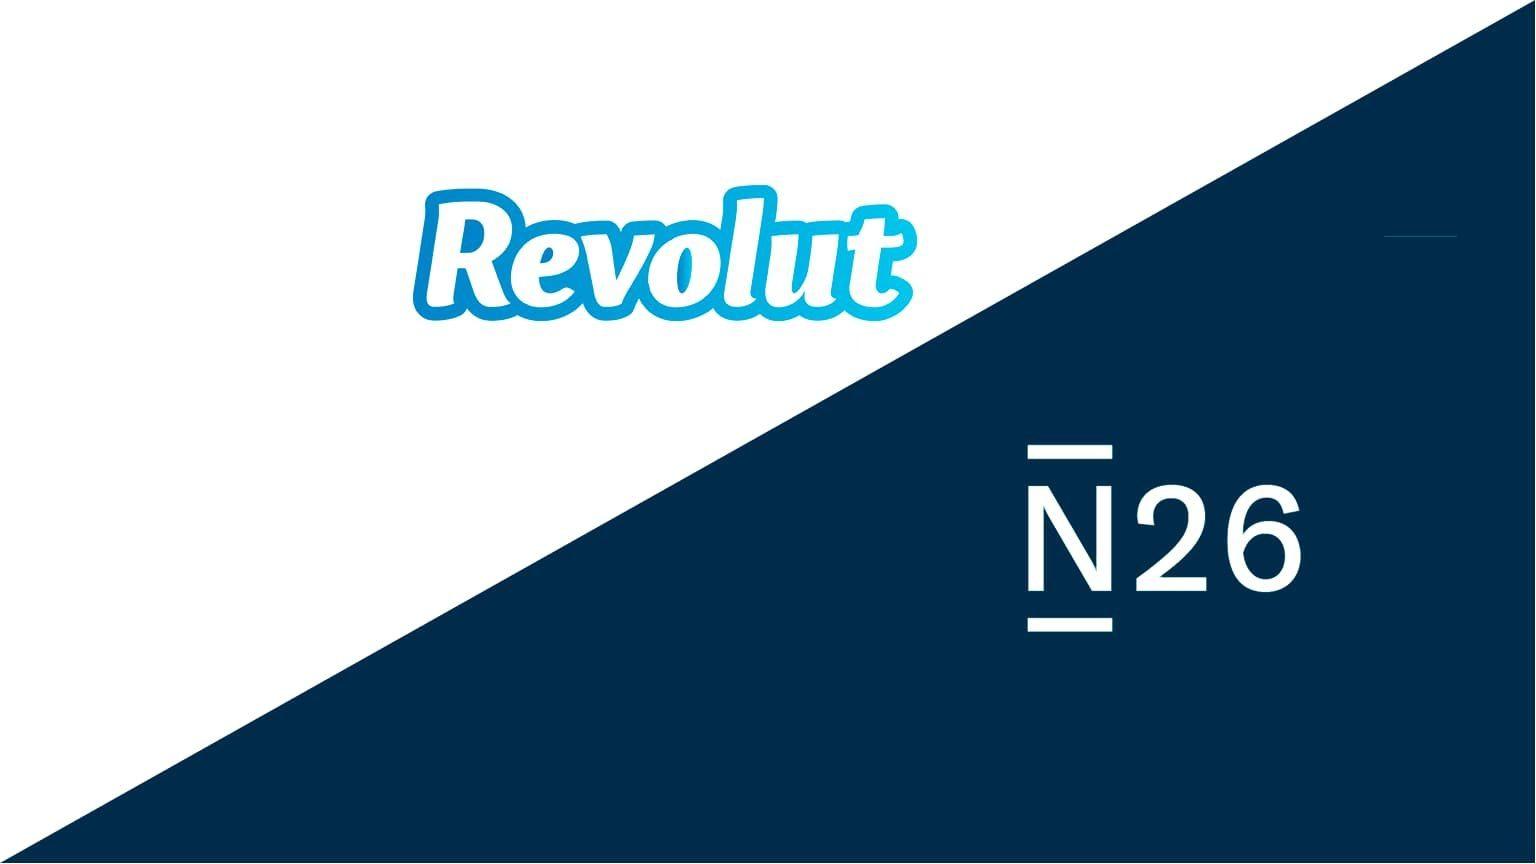 Revolut and N26 logos